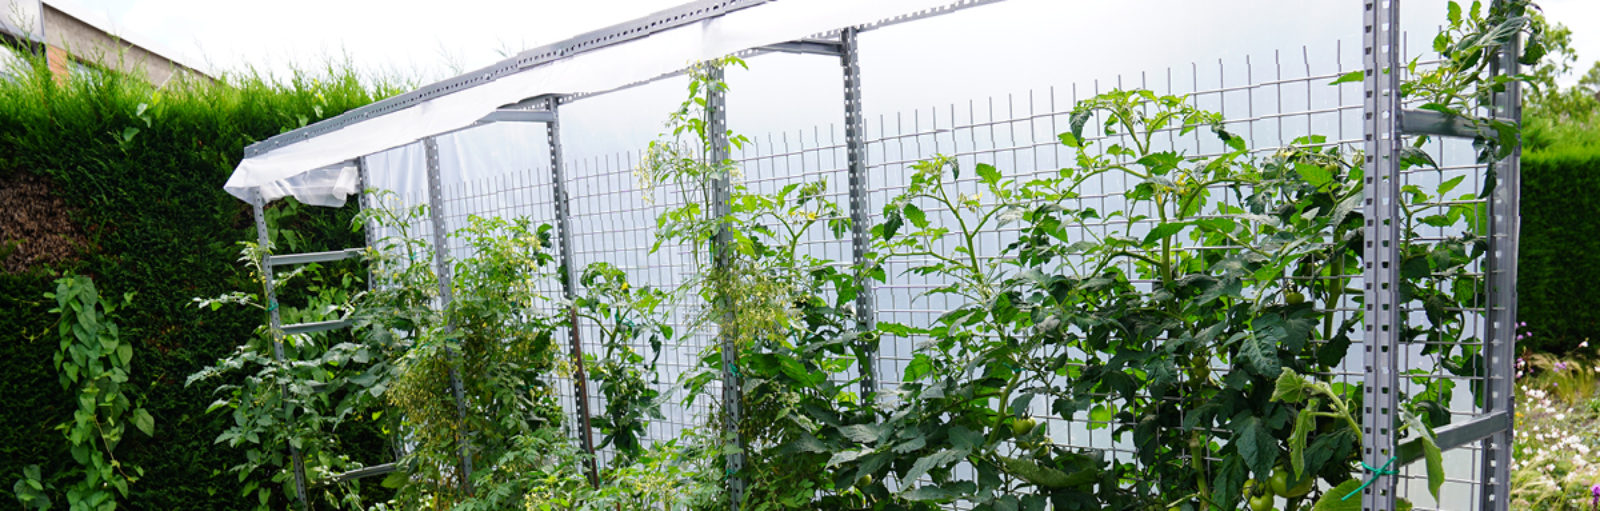 tomatenbakken bij ibic